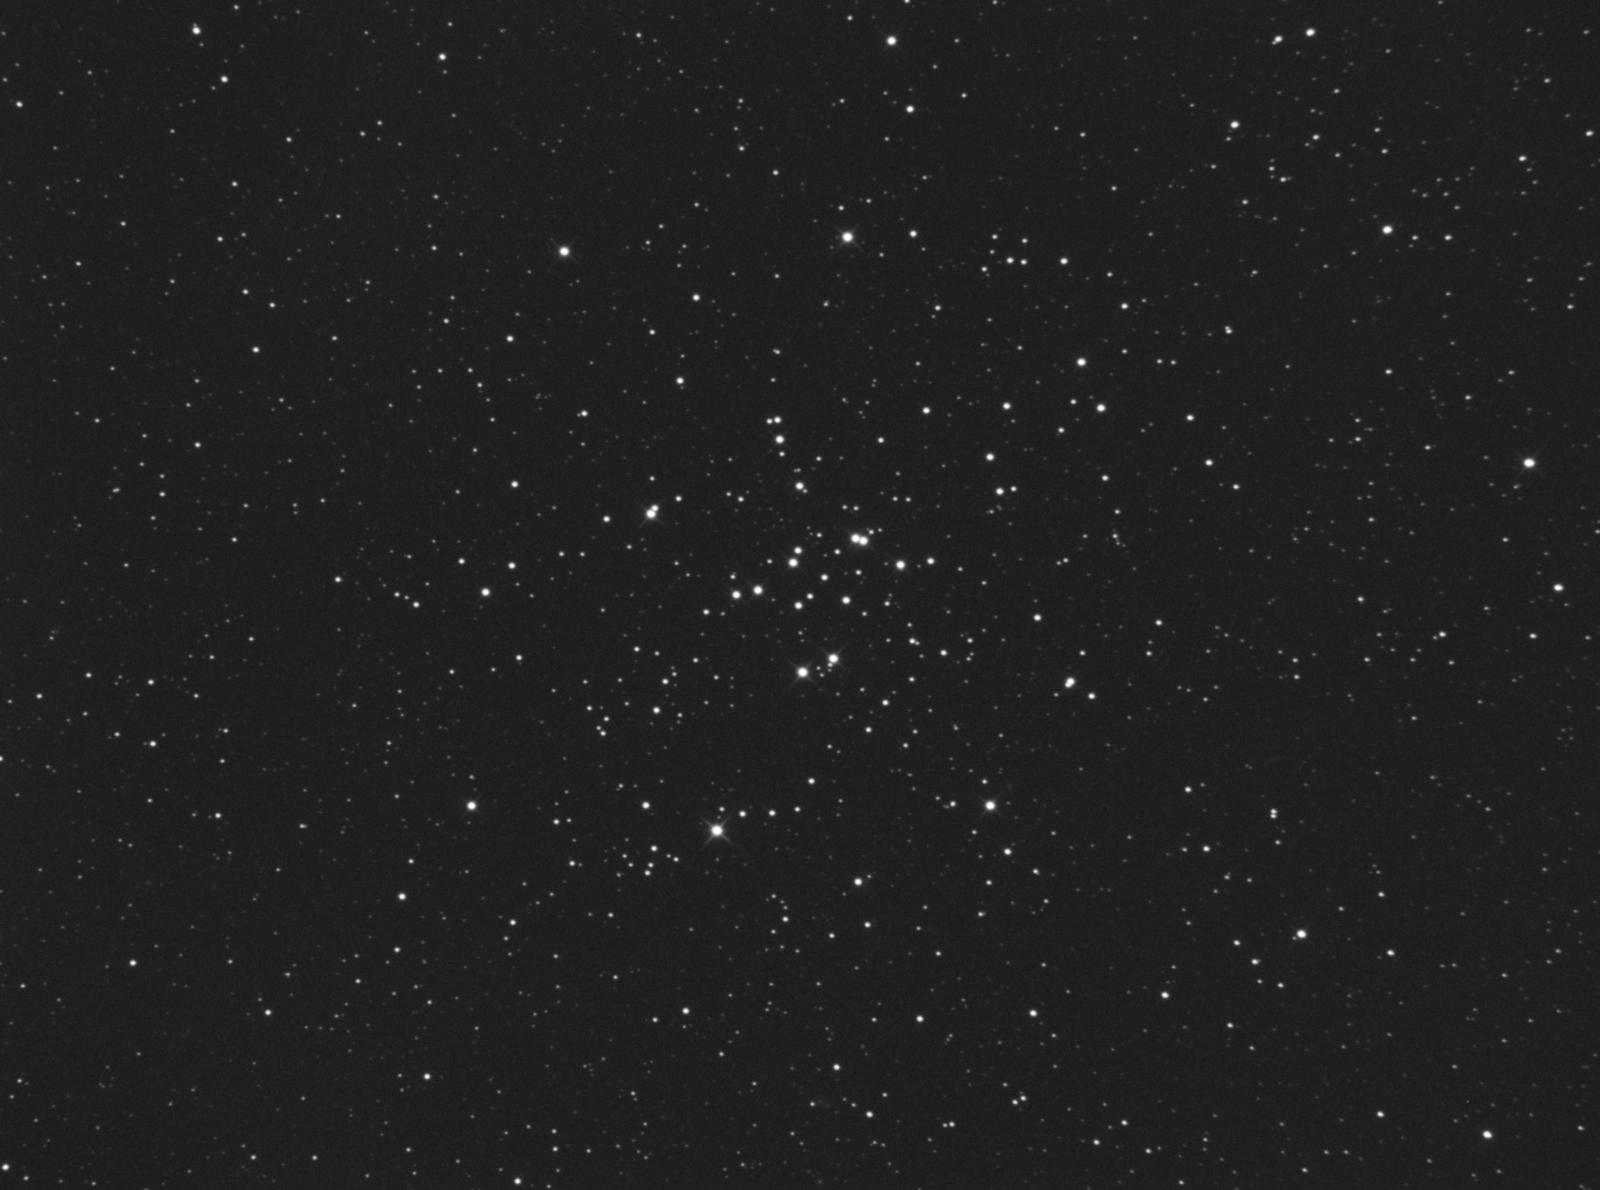 Messier34_0005L_ABE.thumb.png.21c16ce534790d878eb7c3530dcd6499.png